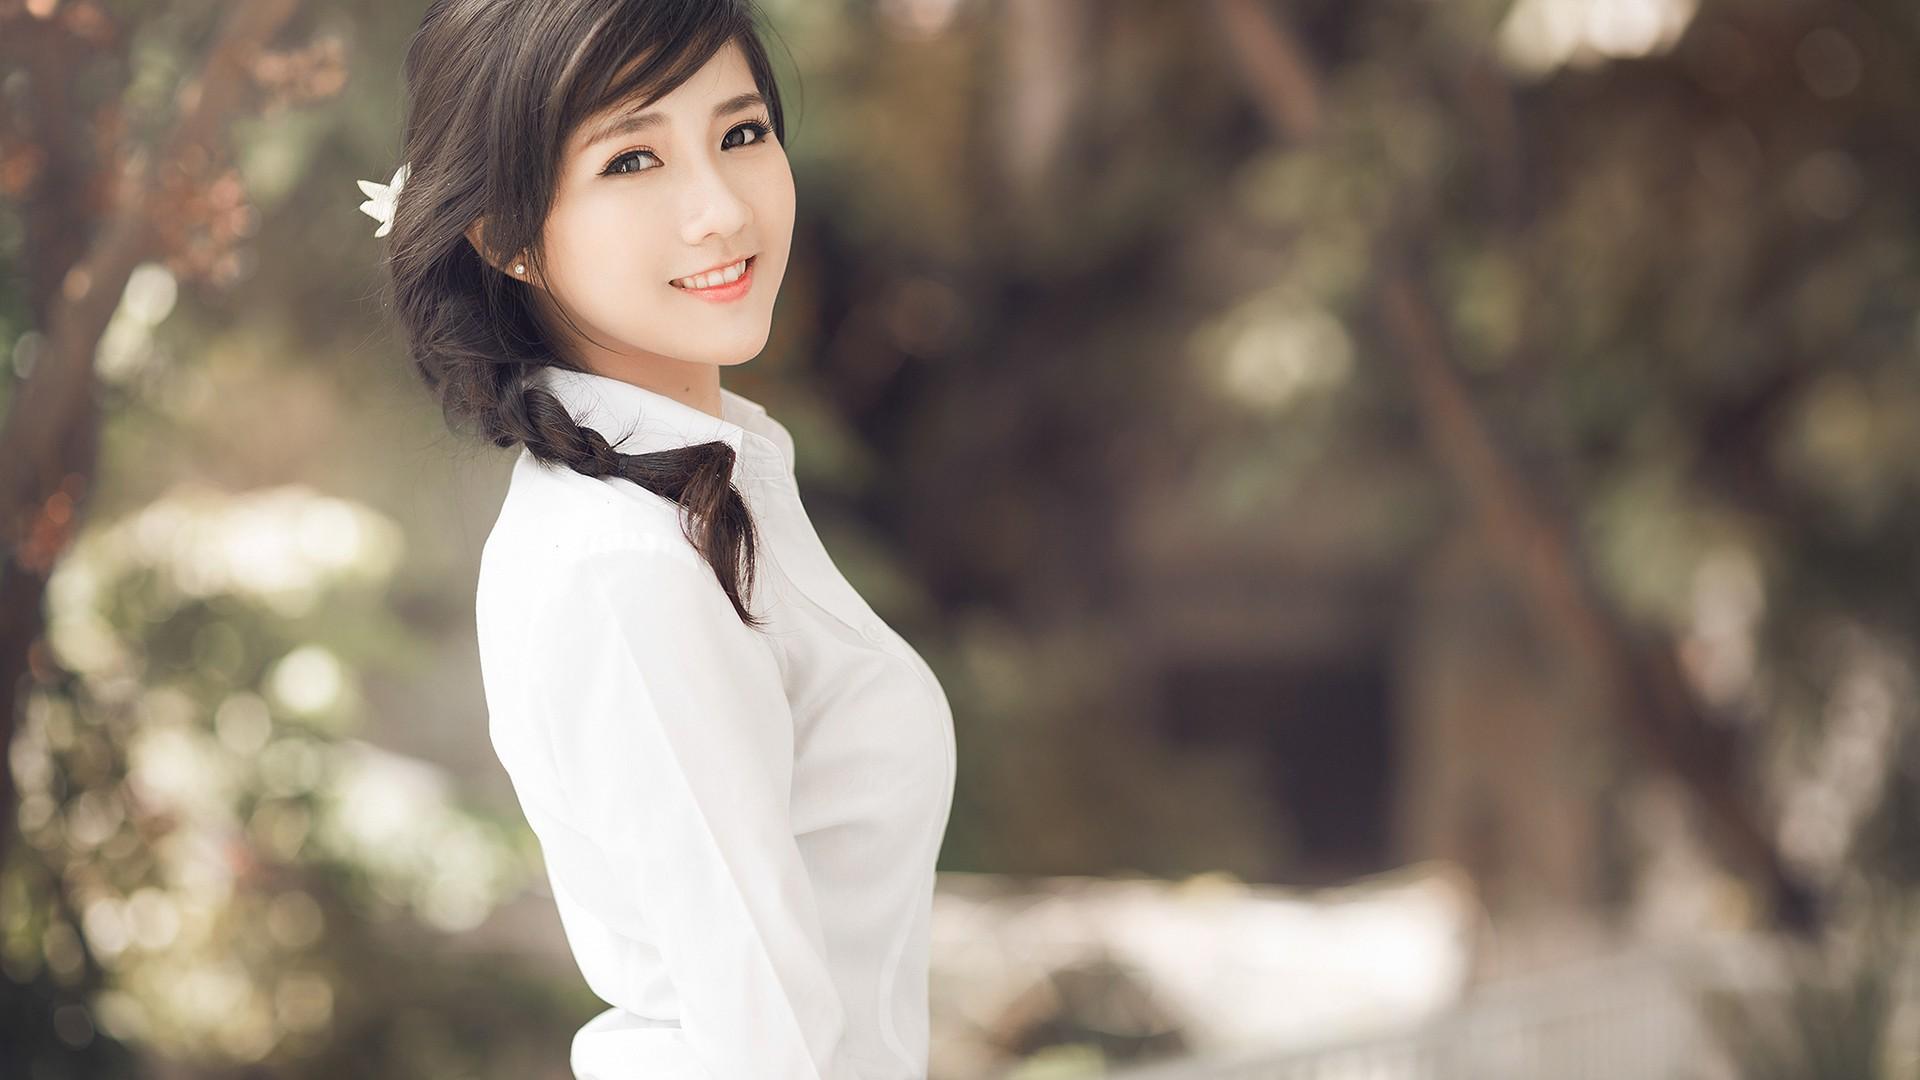 Cute girl photo